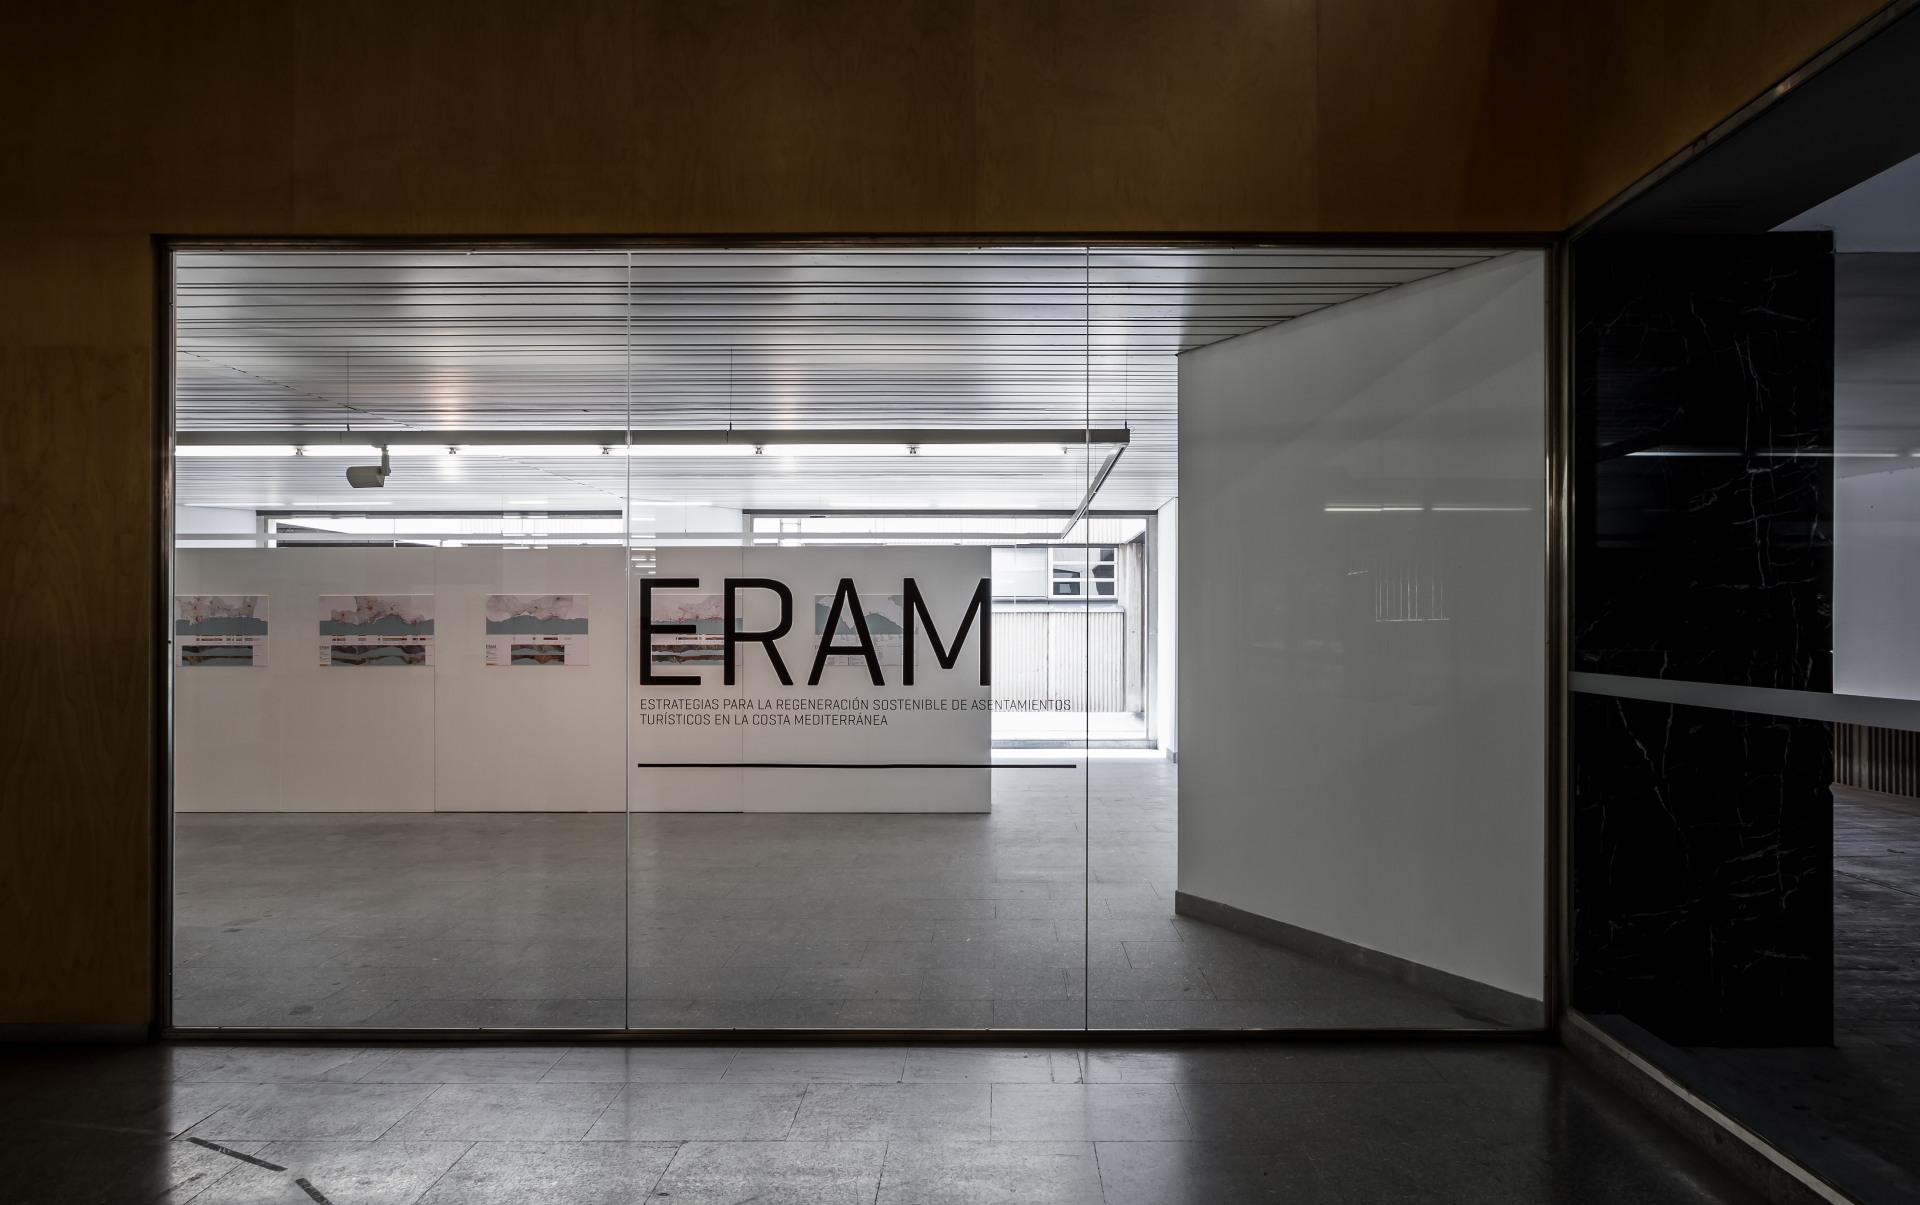 fotografia-arquitectura-valencia-german-cabo-upv-etsav-eram-exposicion (3)